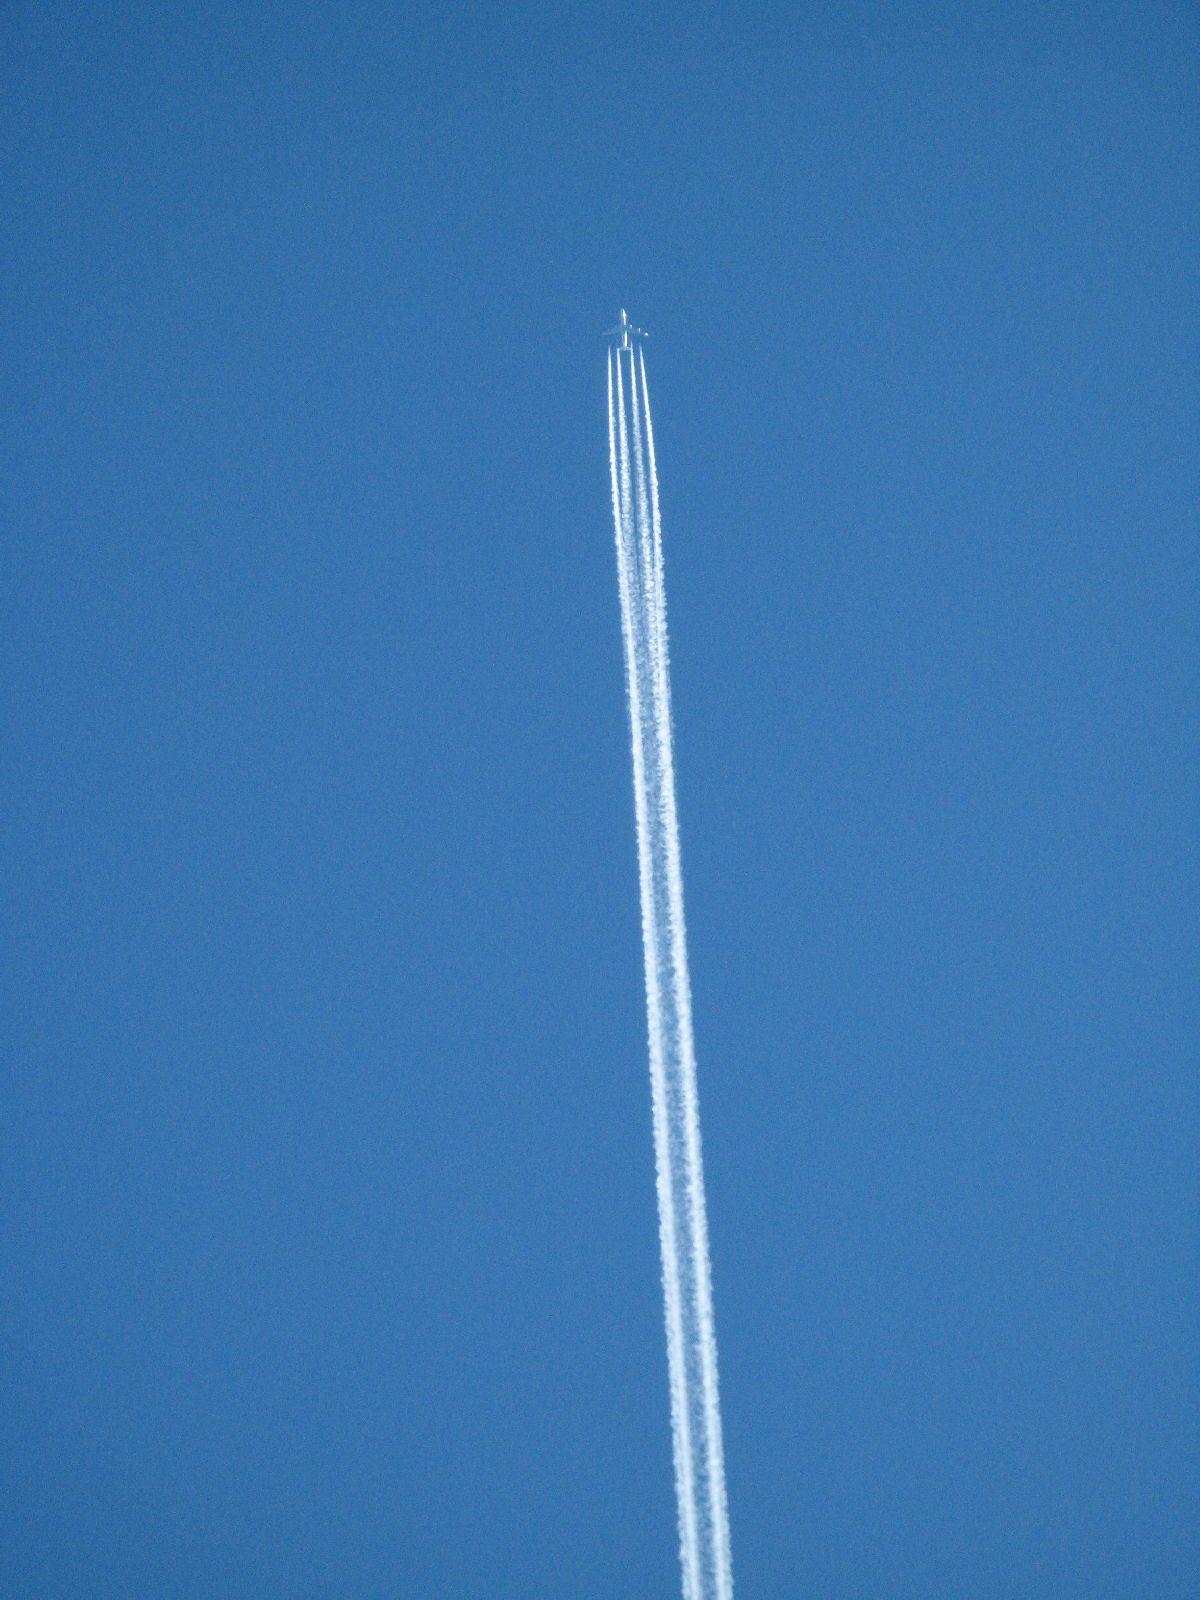 Himmel-Wolken-Foto_Textur_B_5062